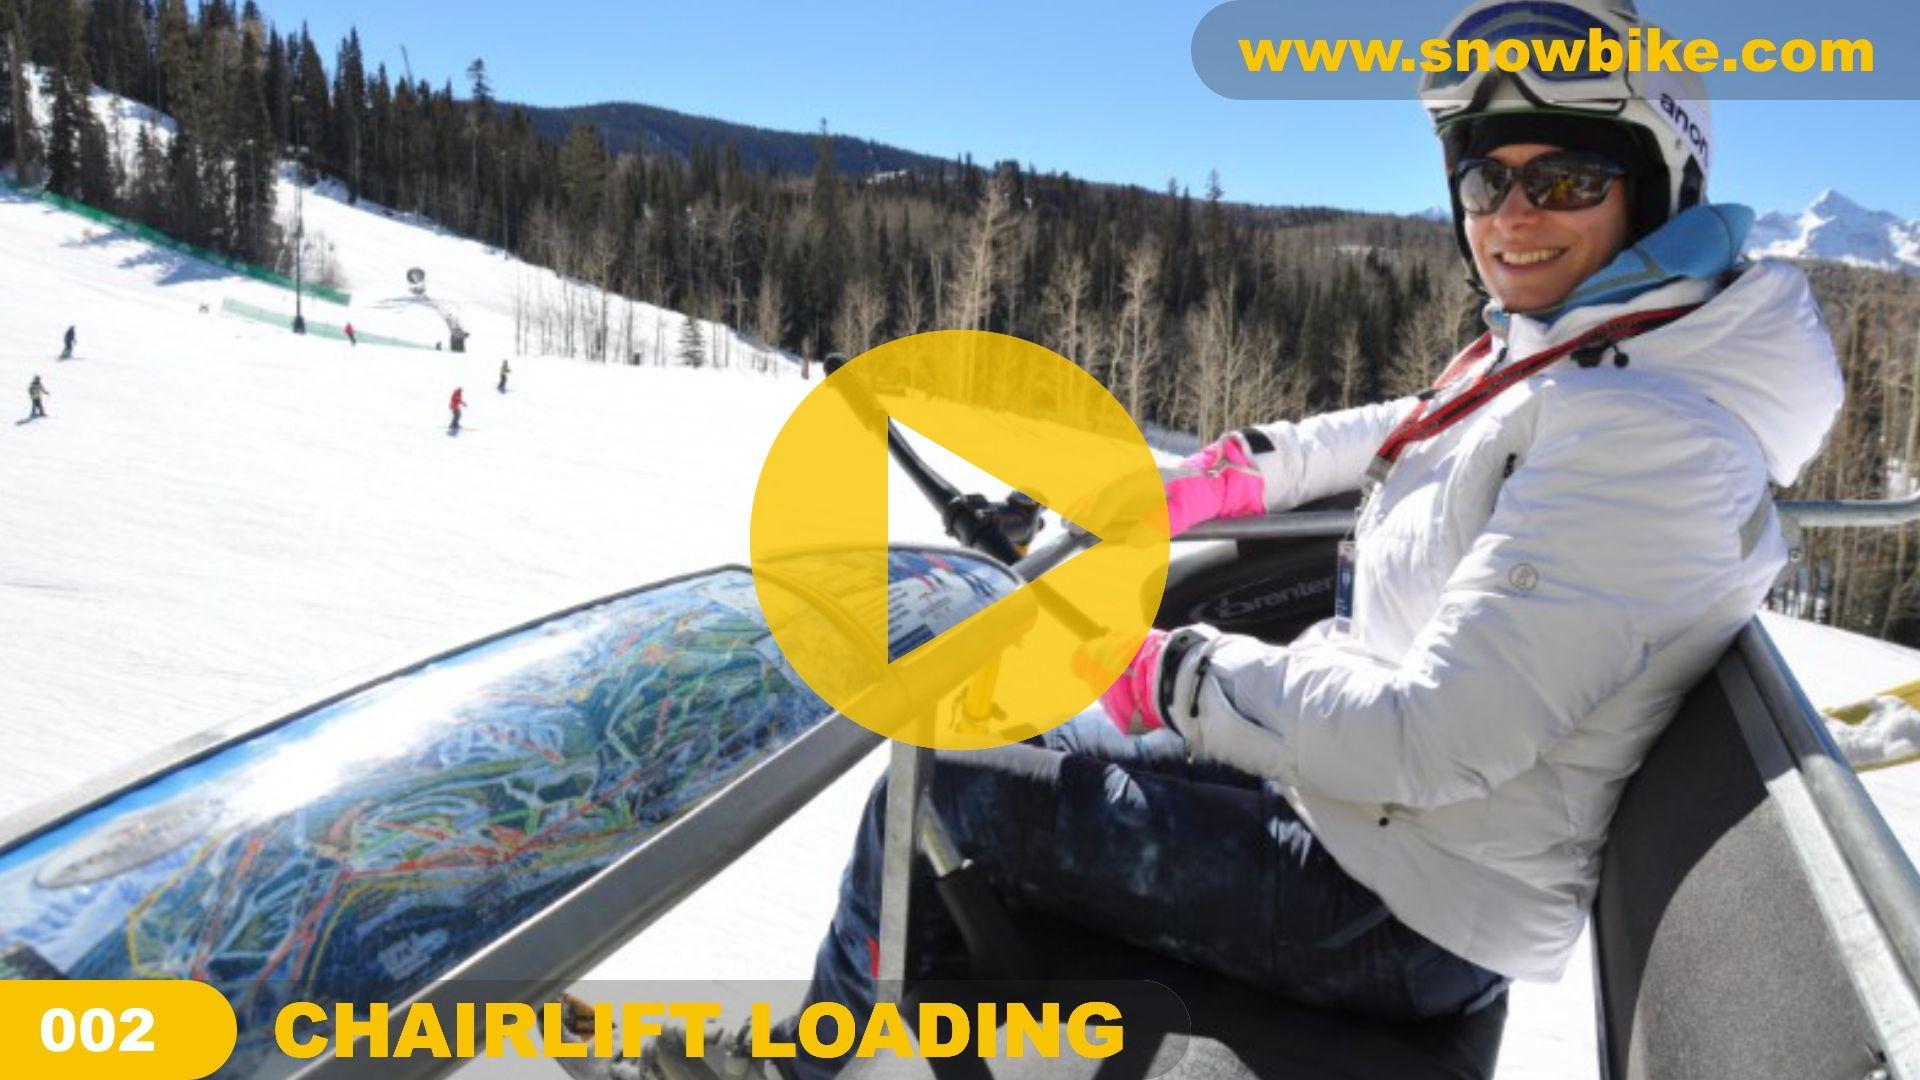 snowbike-basics-chairlift-loading-procedure-cover0DE40C3D-4BBE-5ED0-7CC6-4B57E83C9F41.jpg